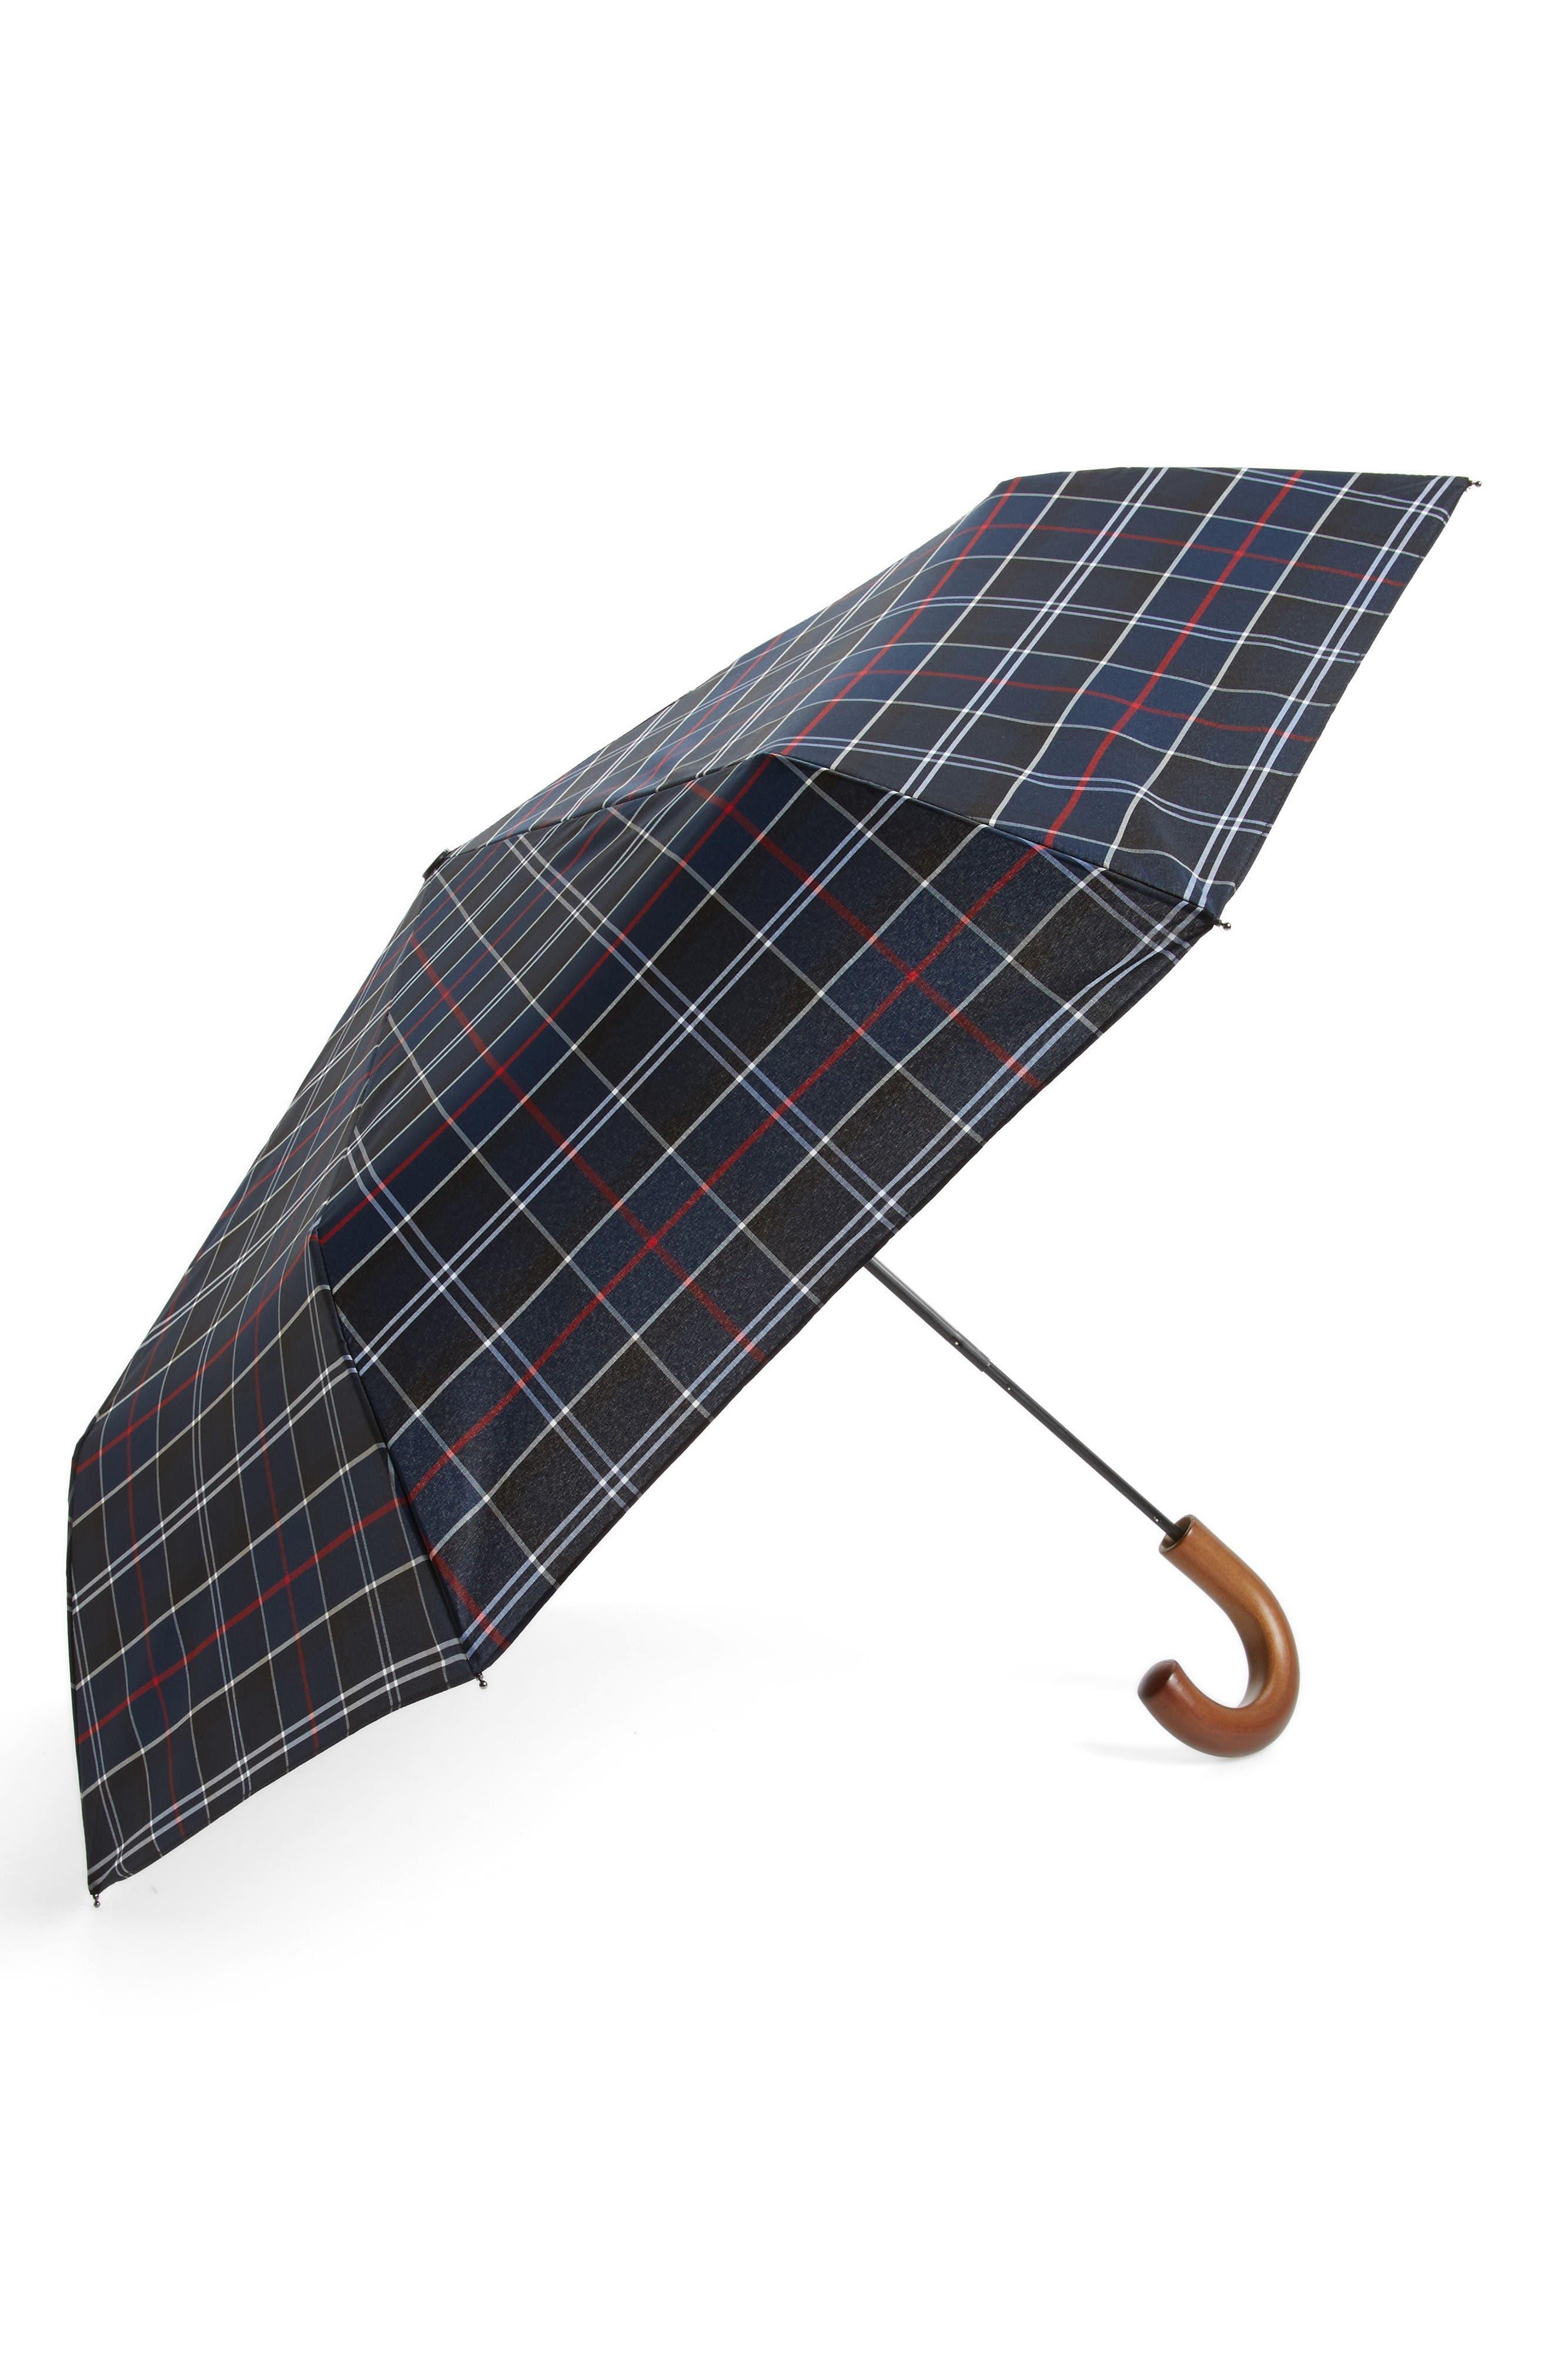 Telescoping Tartan Umbrella,                             Main thumbnail 1, color,                             Navy Tartan